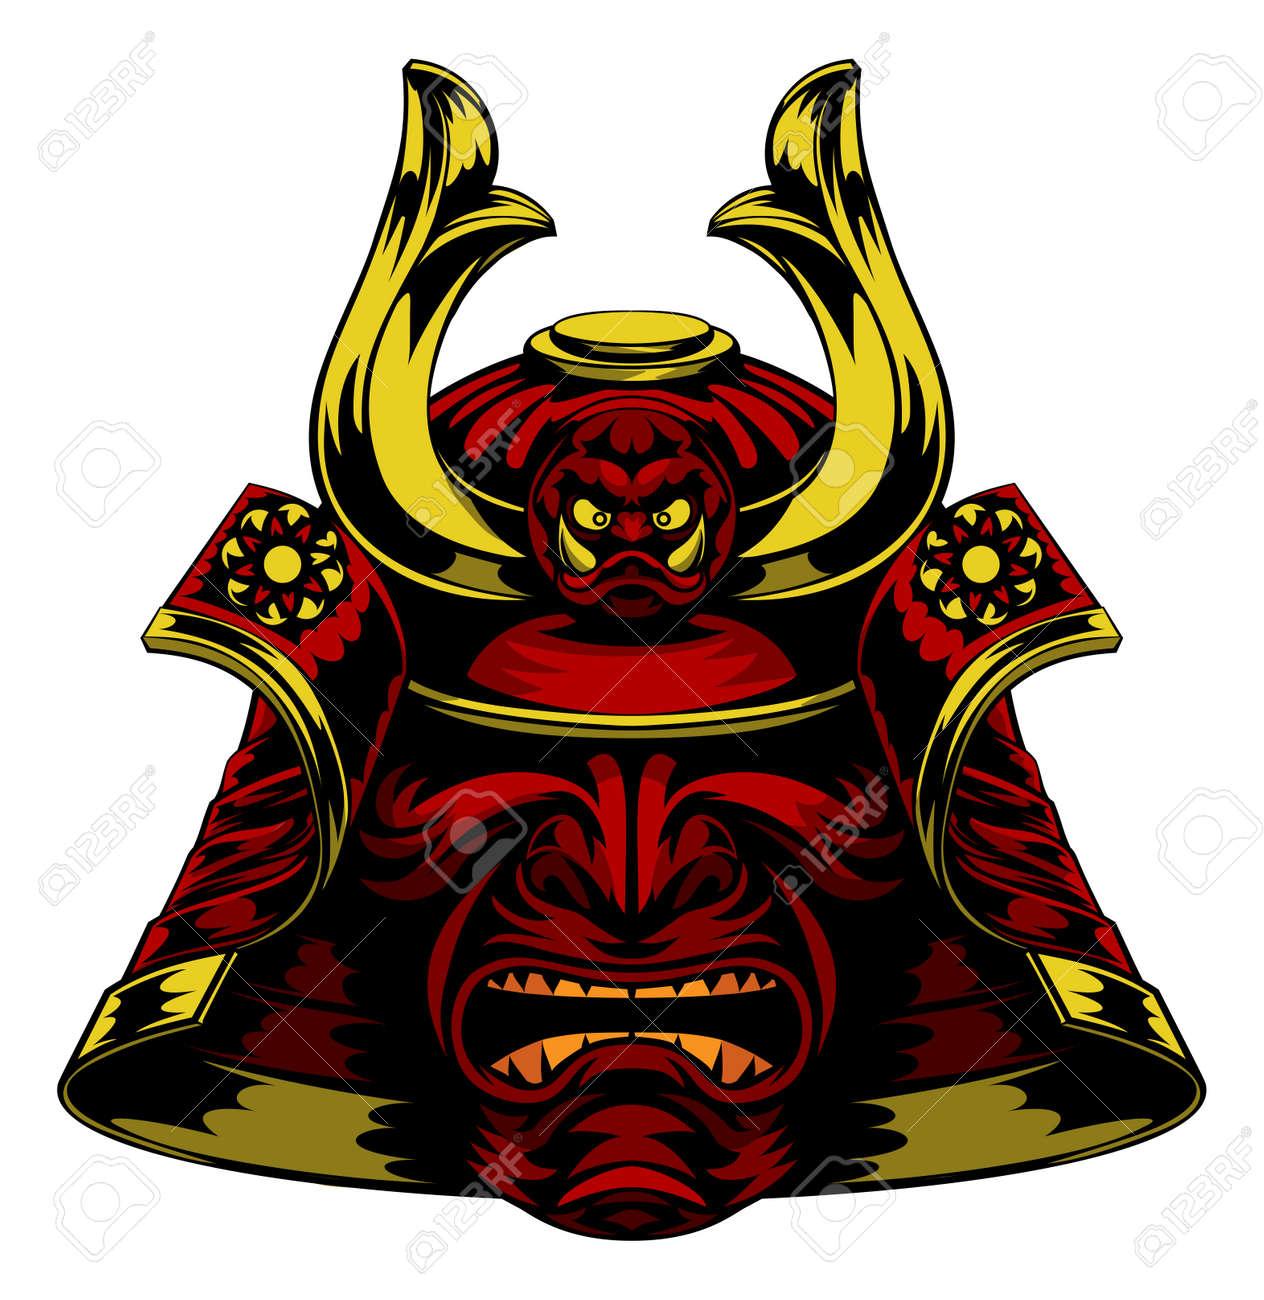 A scary red Samurai Mask Helmet - 54588272